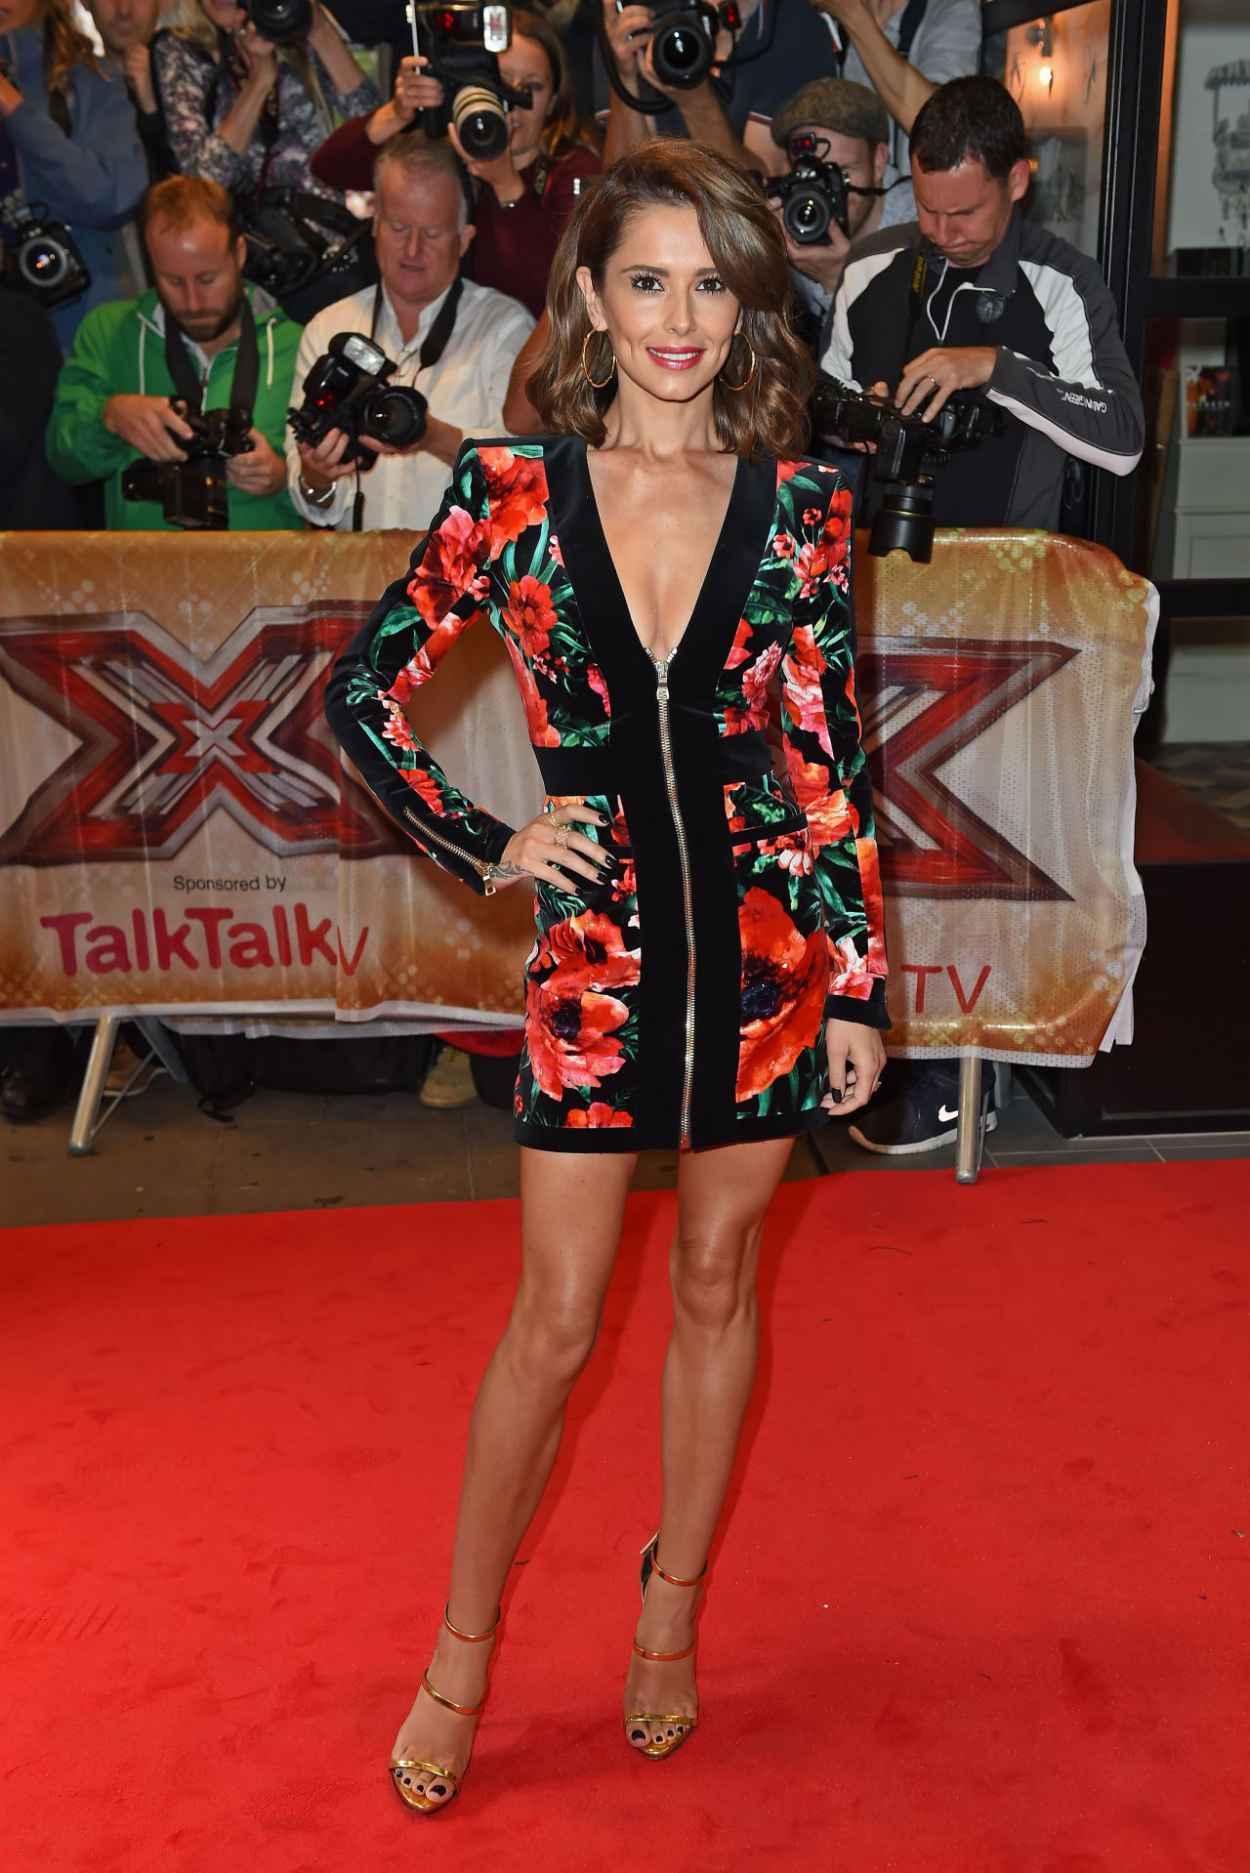 Cheryl Fernandez-Versini - The X-Factor Press Launch in London, August 2015-4